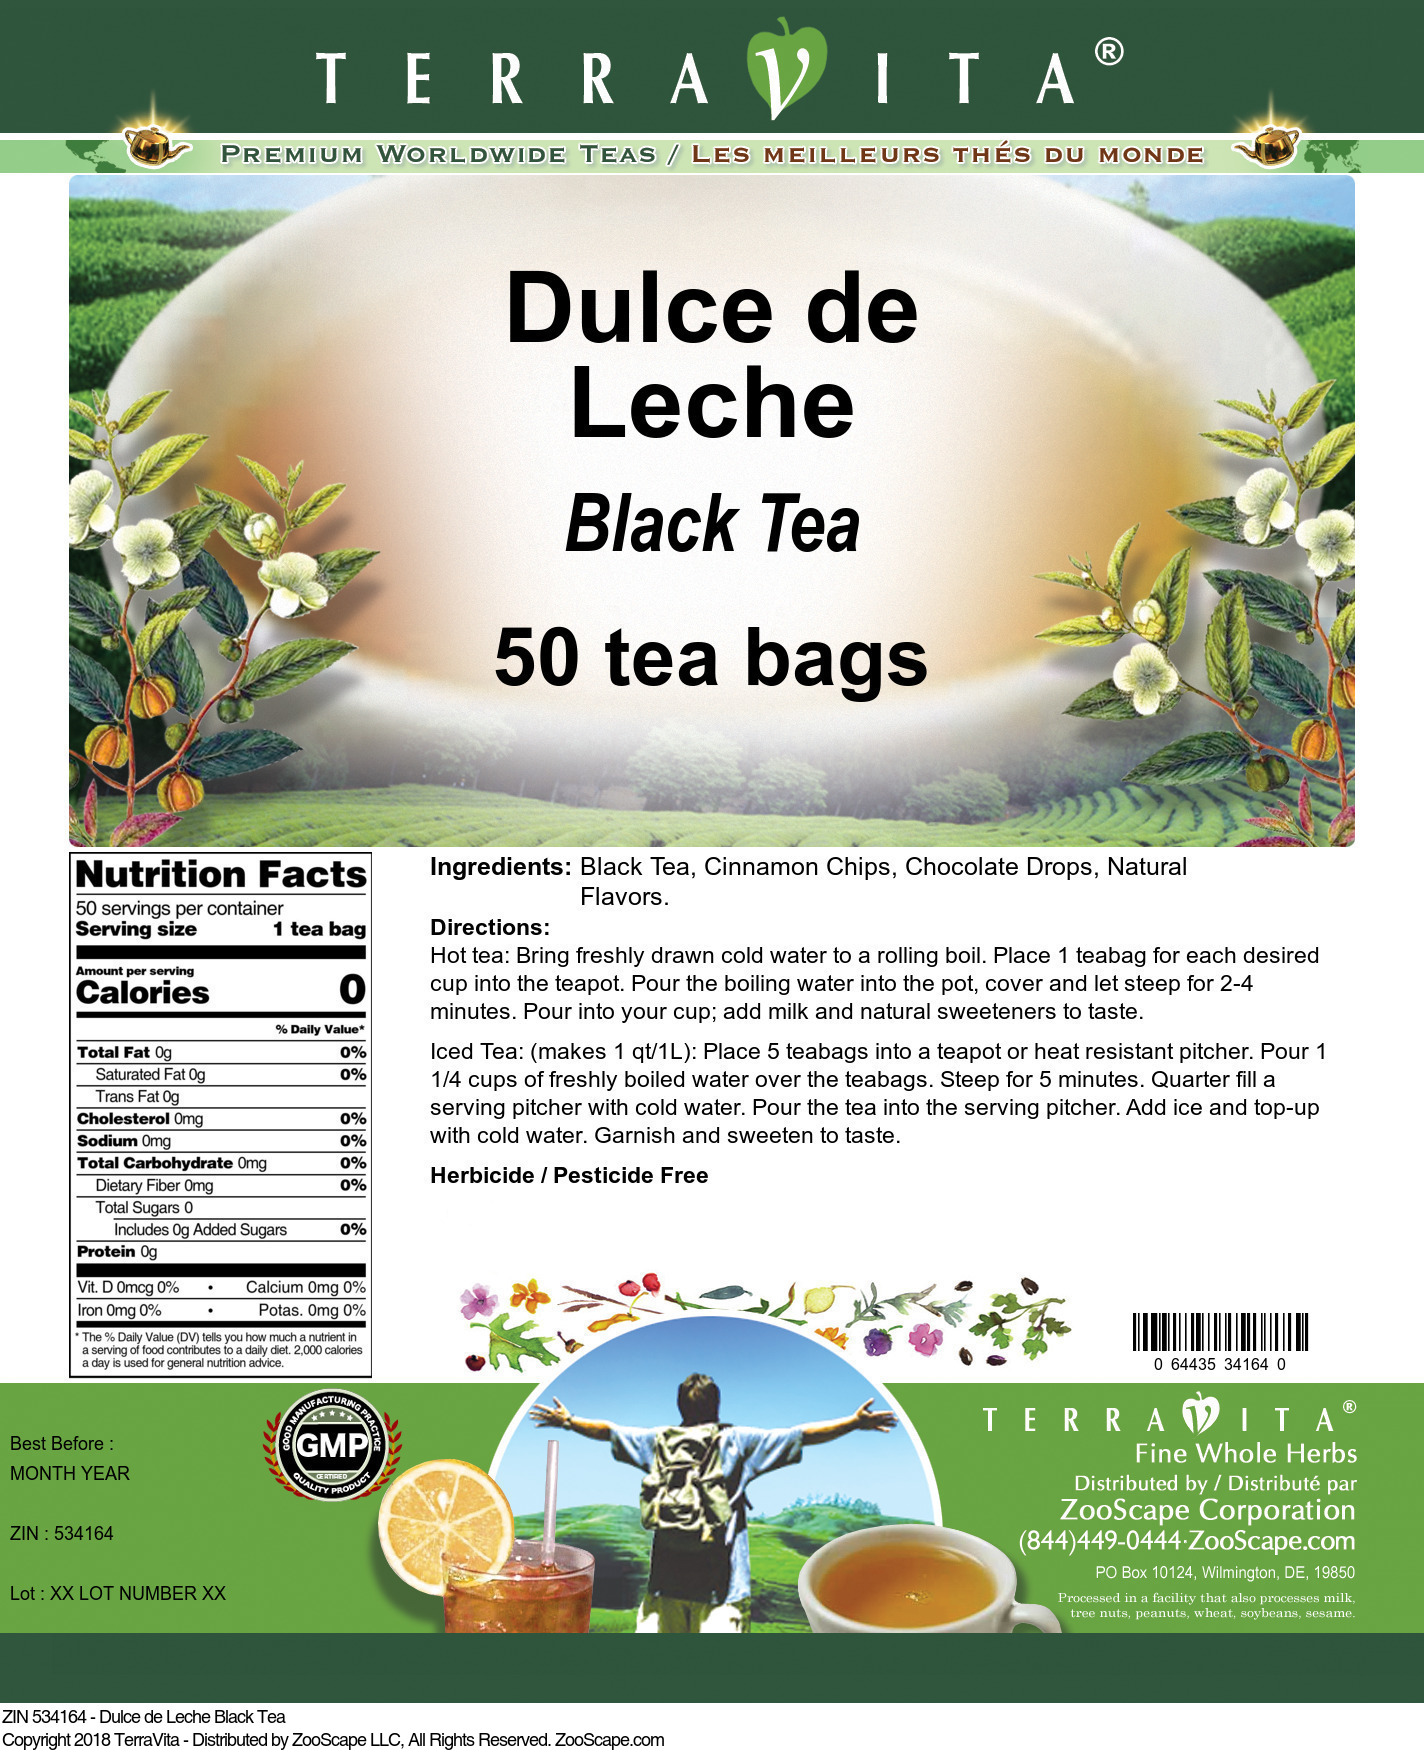 Dulce de Leche Black Tea